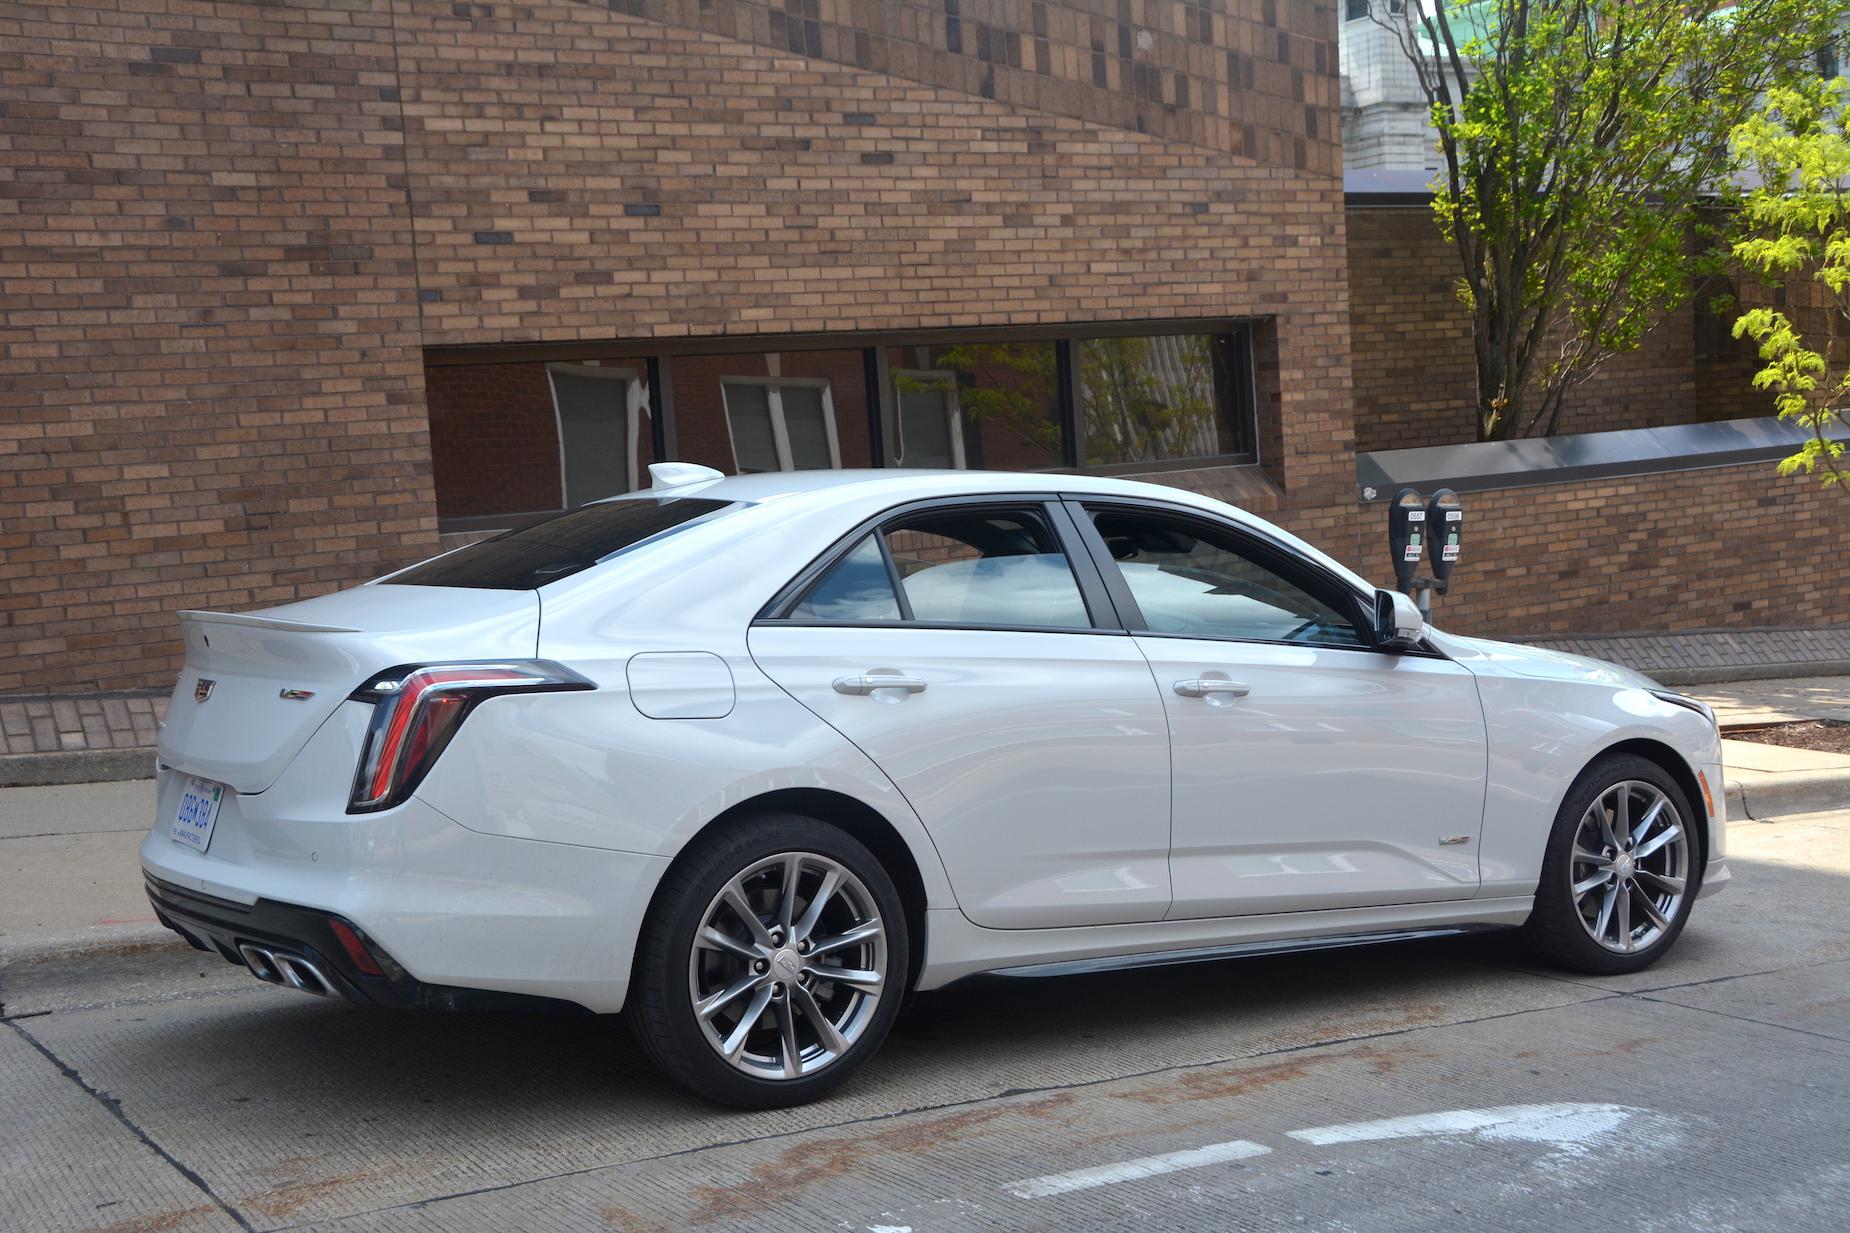 2021 Cadillac CT4-V wheels